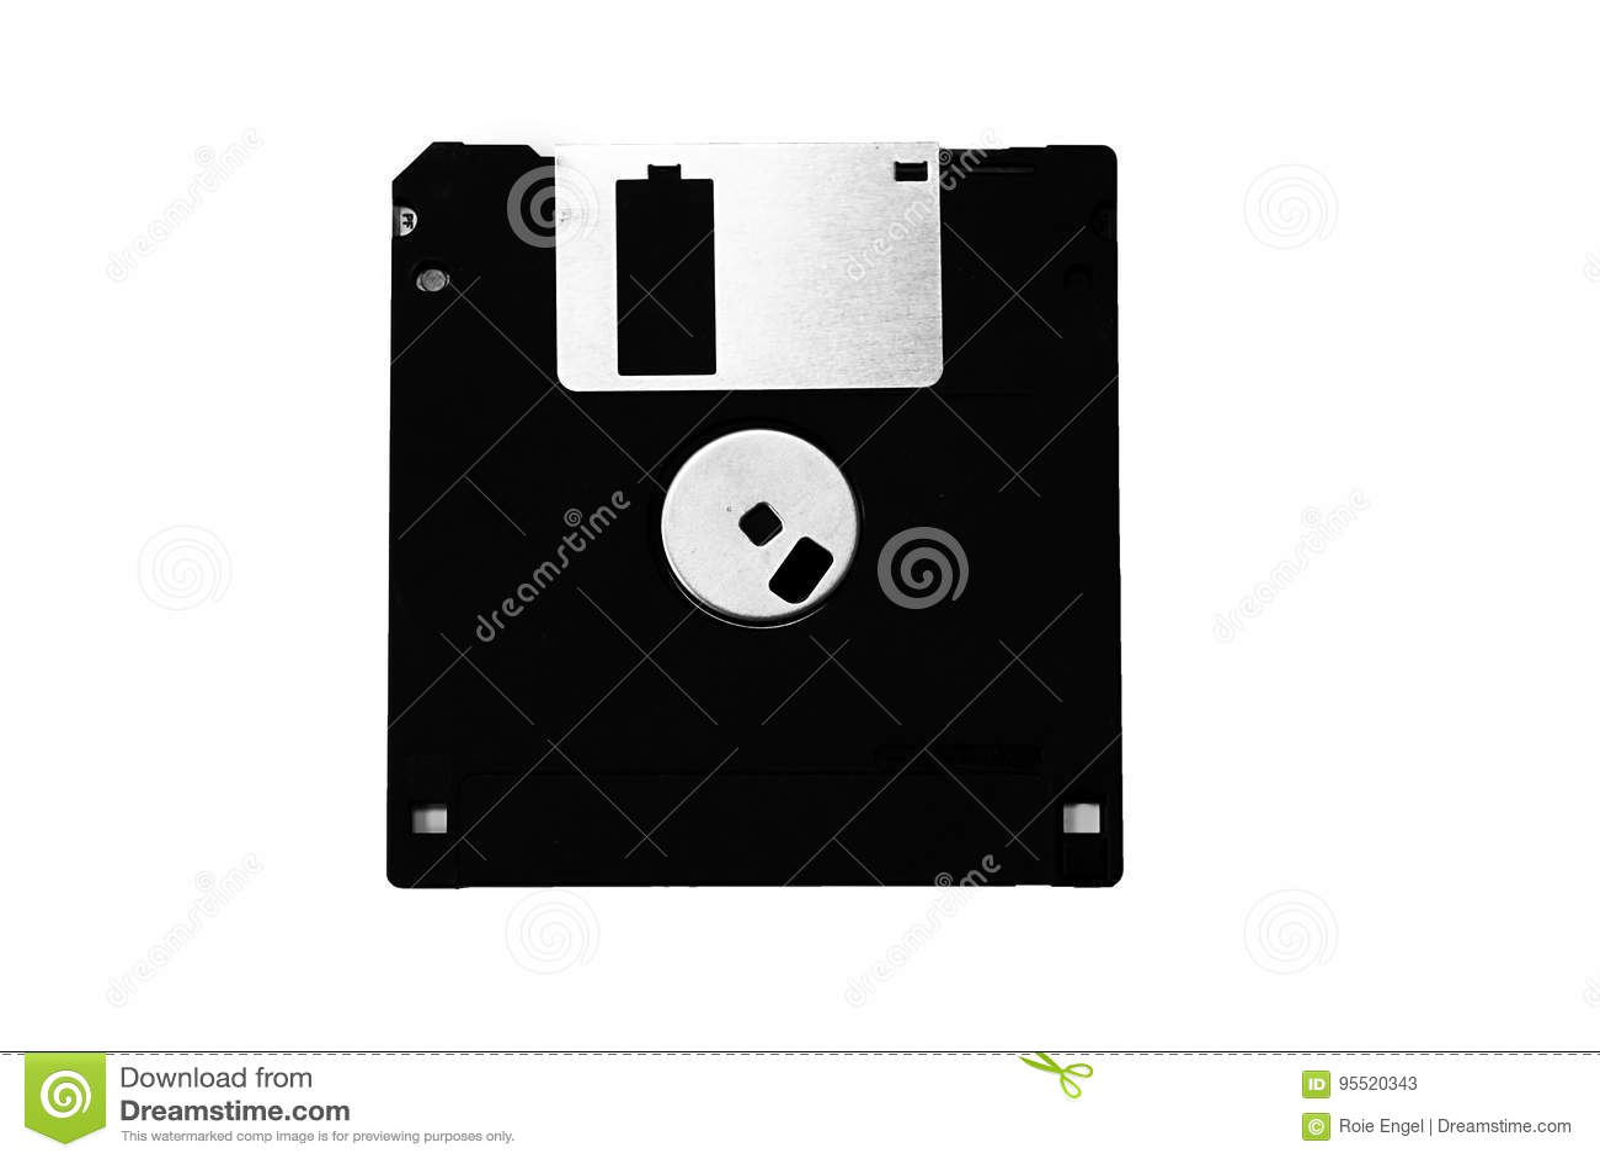 floppy office sticky notes floppy disk image in black and white floppy disk image in black and white stock illustration